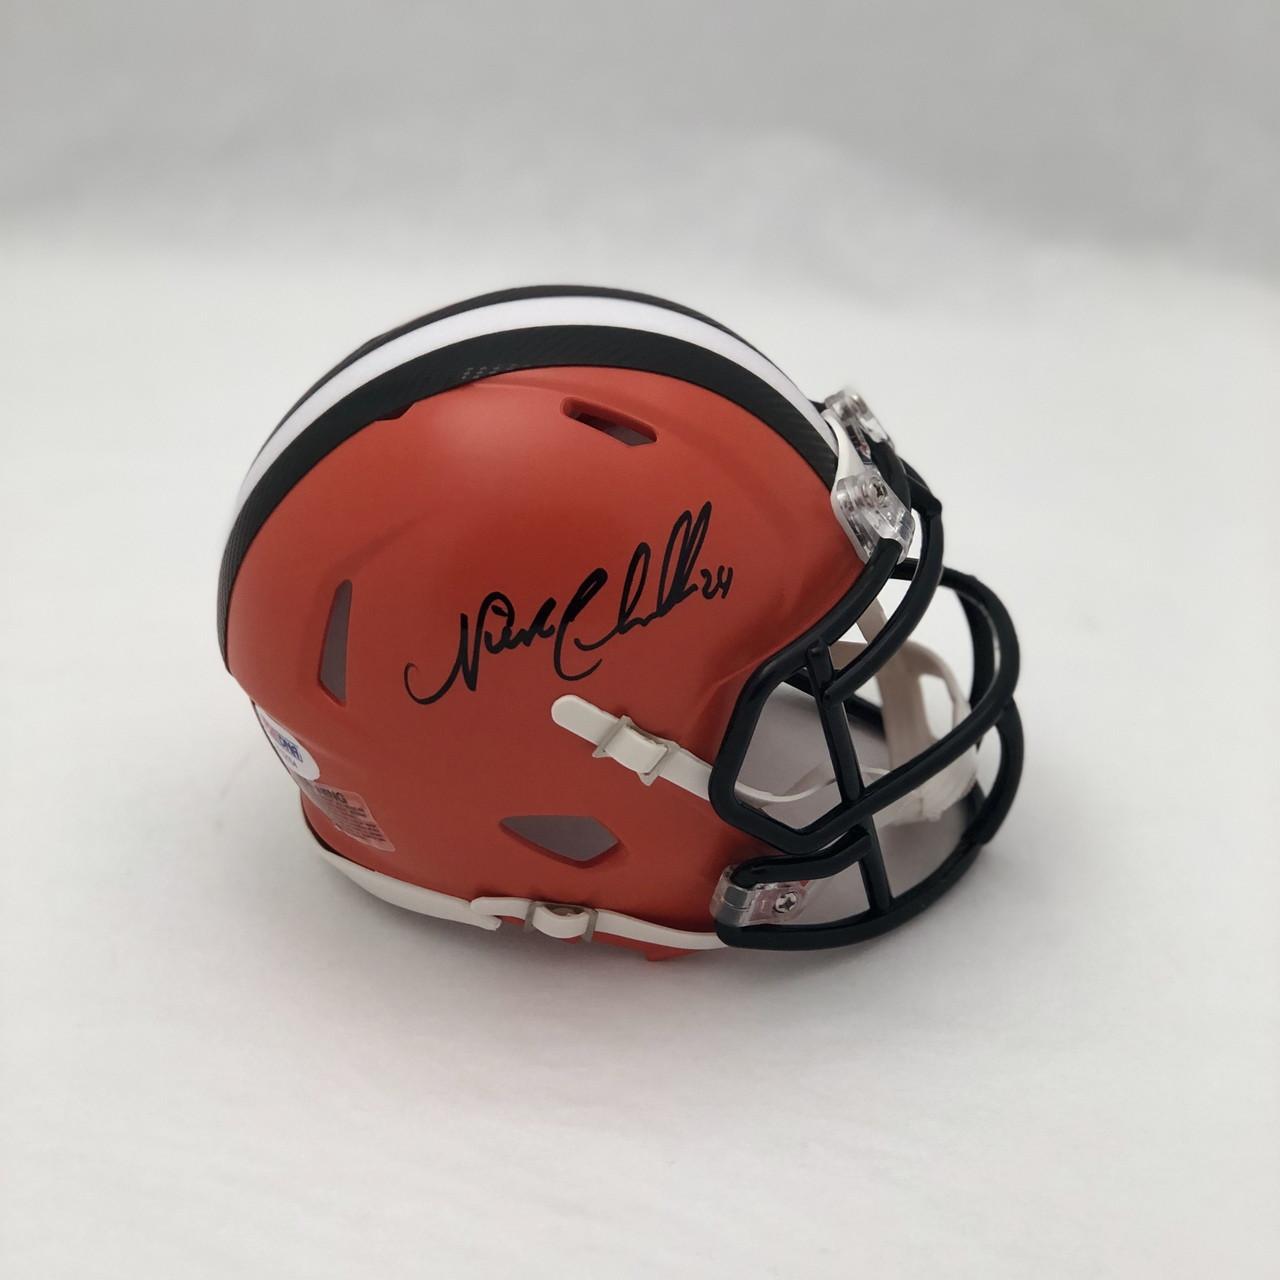 reputable site c8b65 839eb Nick Chubb Cleveland Browns Autographed Mini Helmet - PSA Authentic